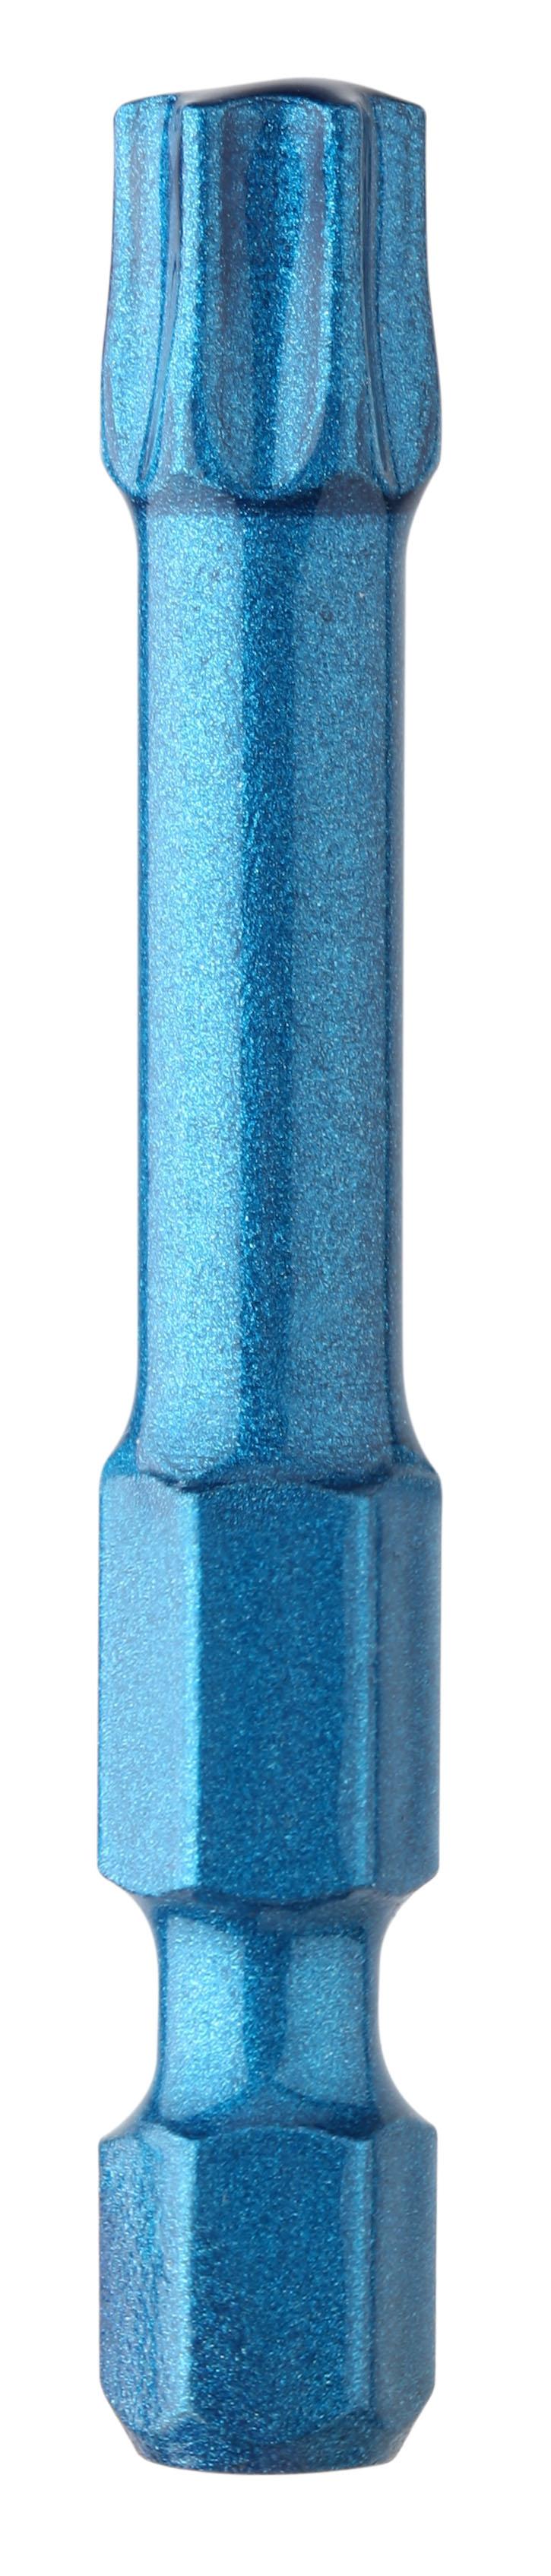 Vissage Embout impact Blue Shock Embout impact Blue-Shock Torx® - L30 & 50mm - U613T30L050.jpg